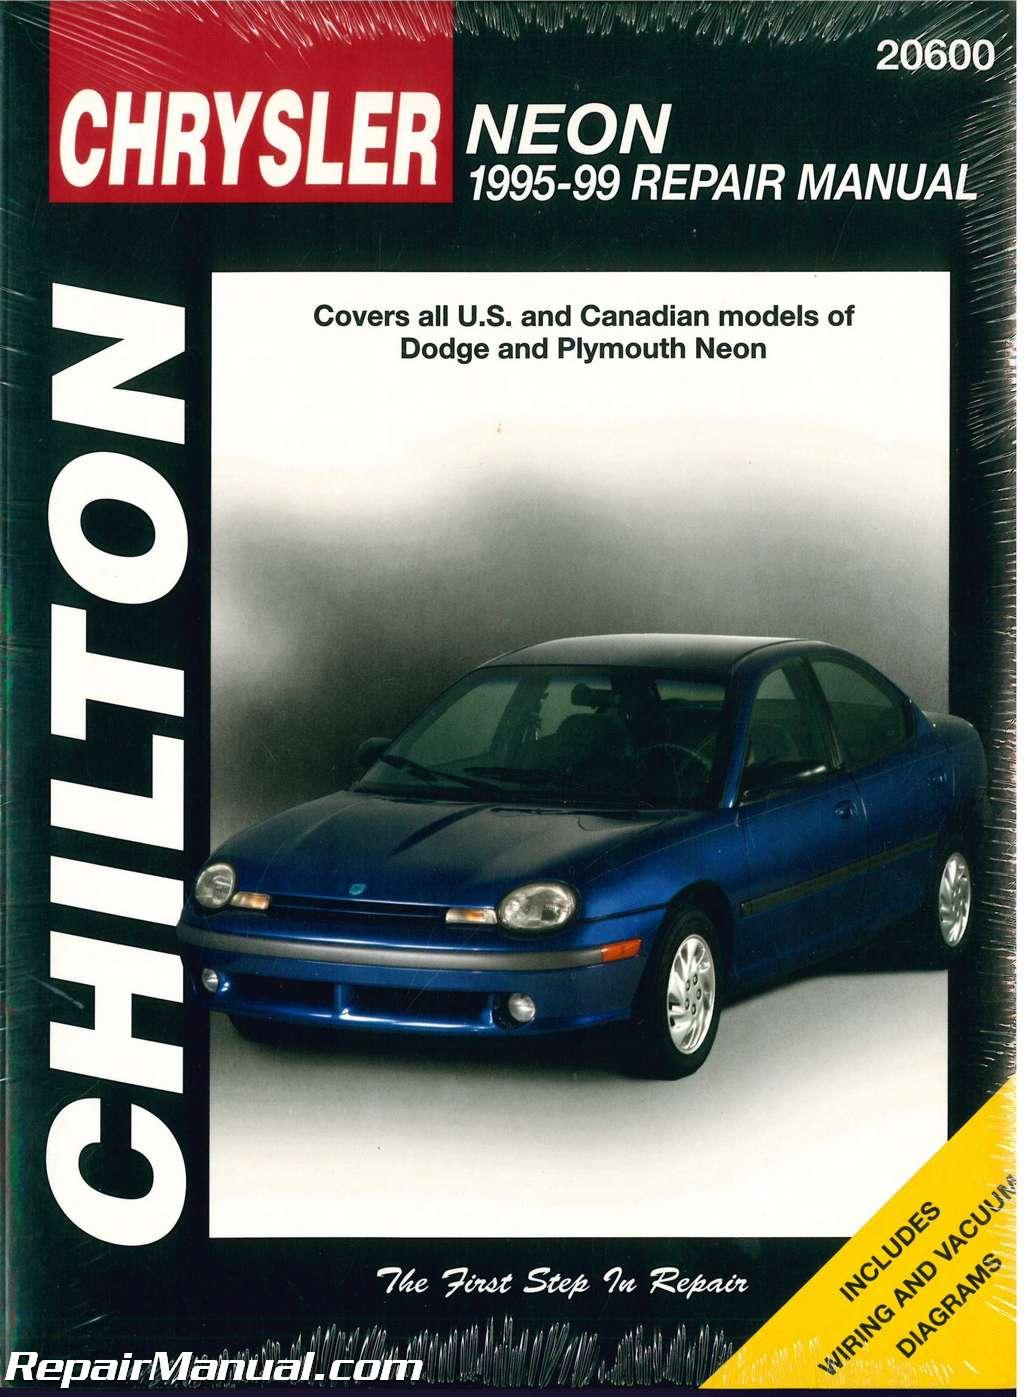 used chilton dodge neon 1995 1999 repair manual rh repairmanual com chrysler neon service manual chrysler neon service manual